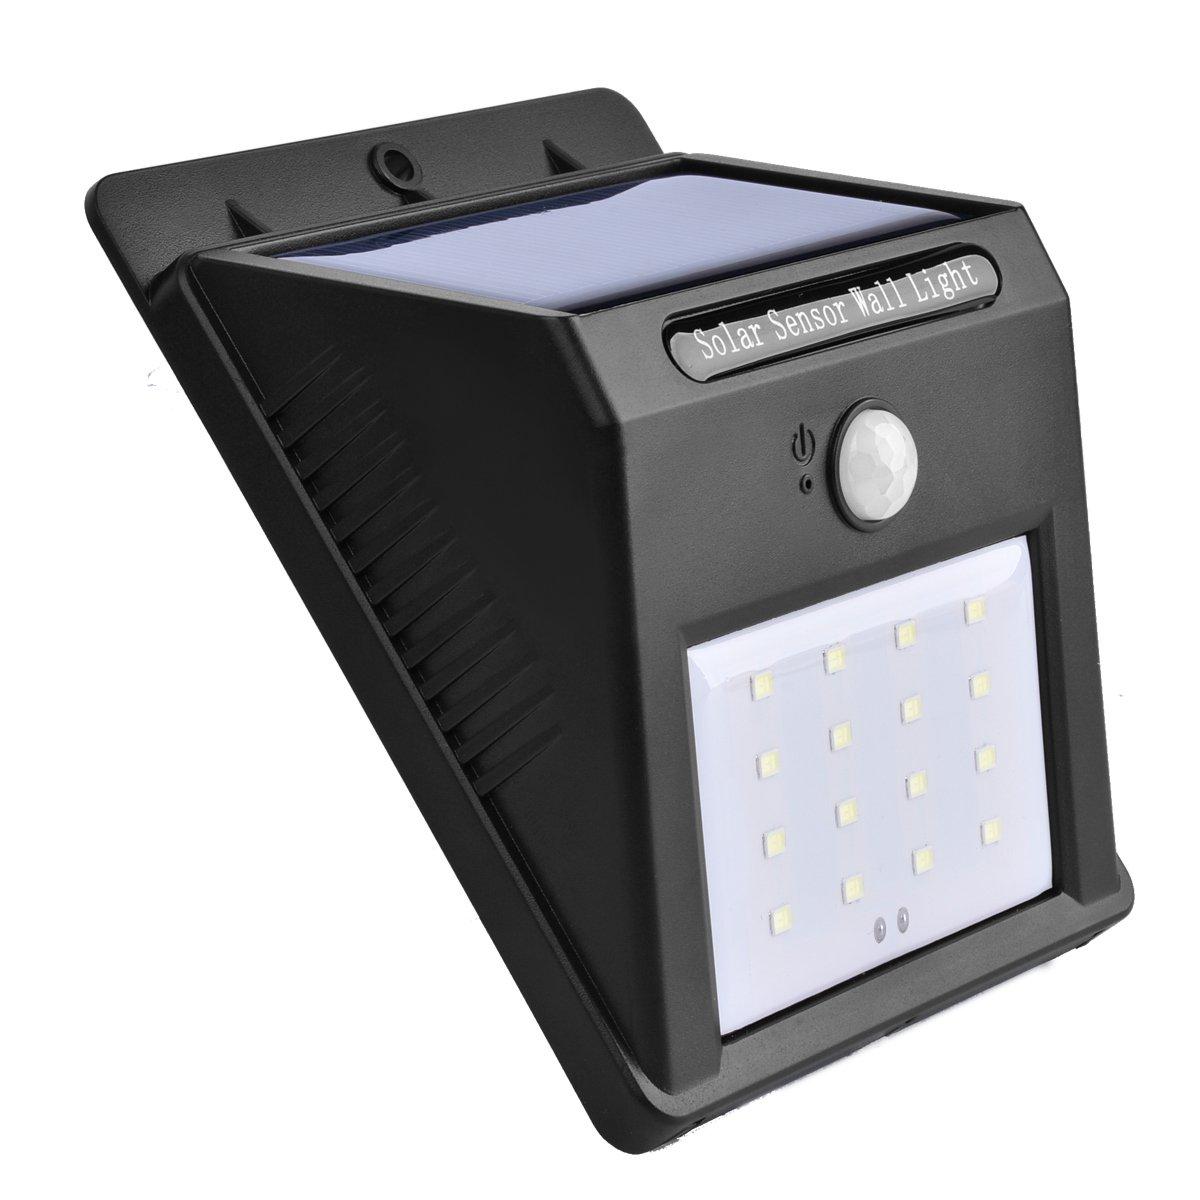 Zehui 16 LED屋外ソーラーPowerdワイヤレス防水セキュリティモーションセンサーライトソーラーライト 4pcs mhy-CH0126-jj53 B079C3FRLP  4pcs